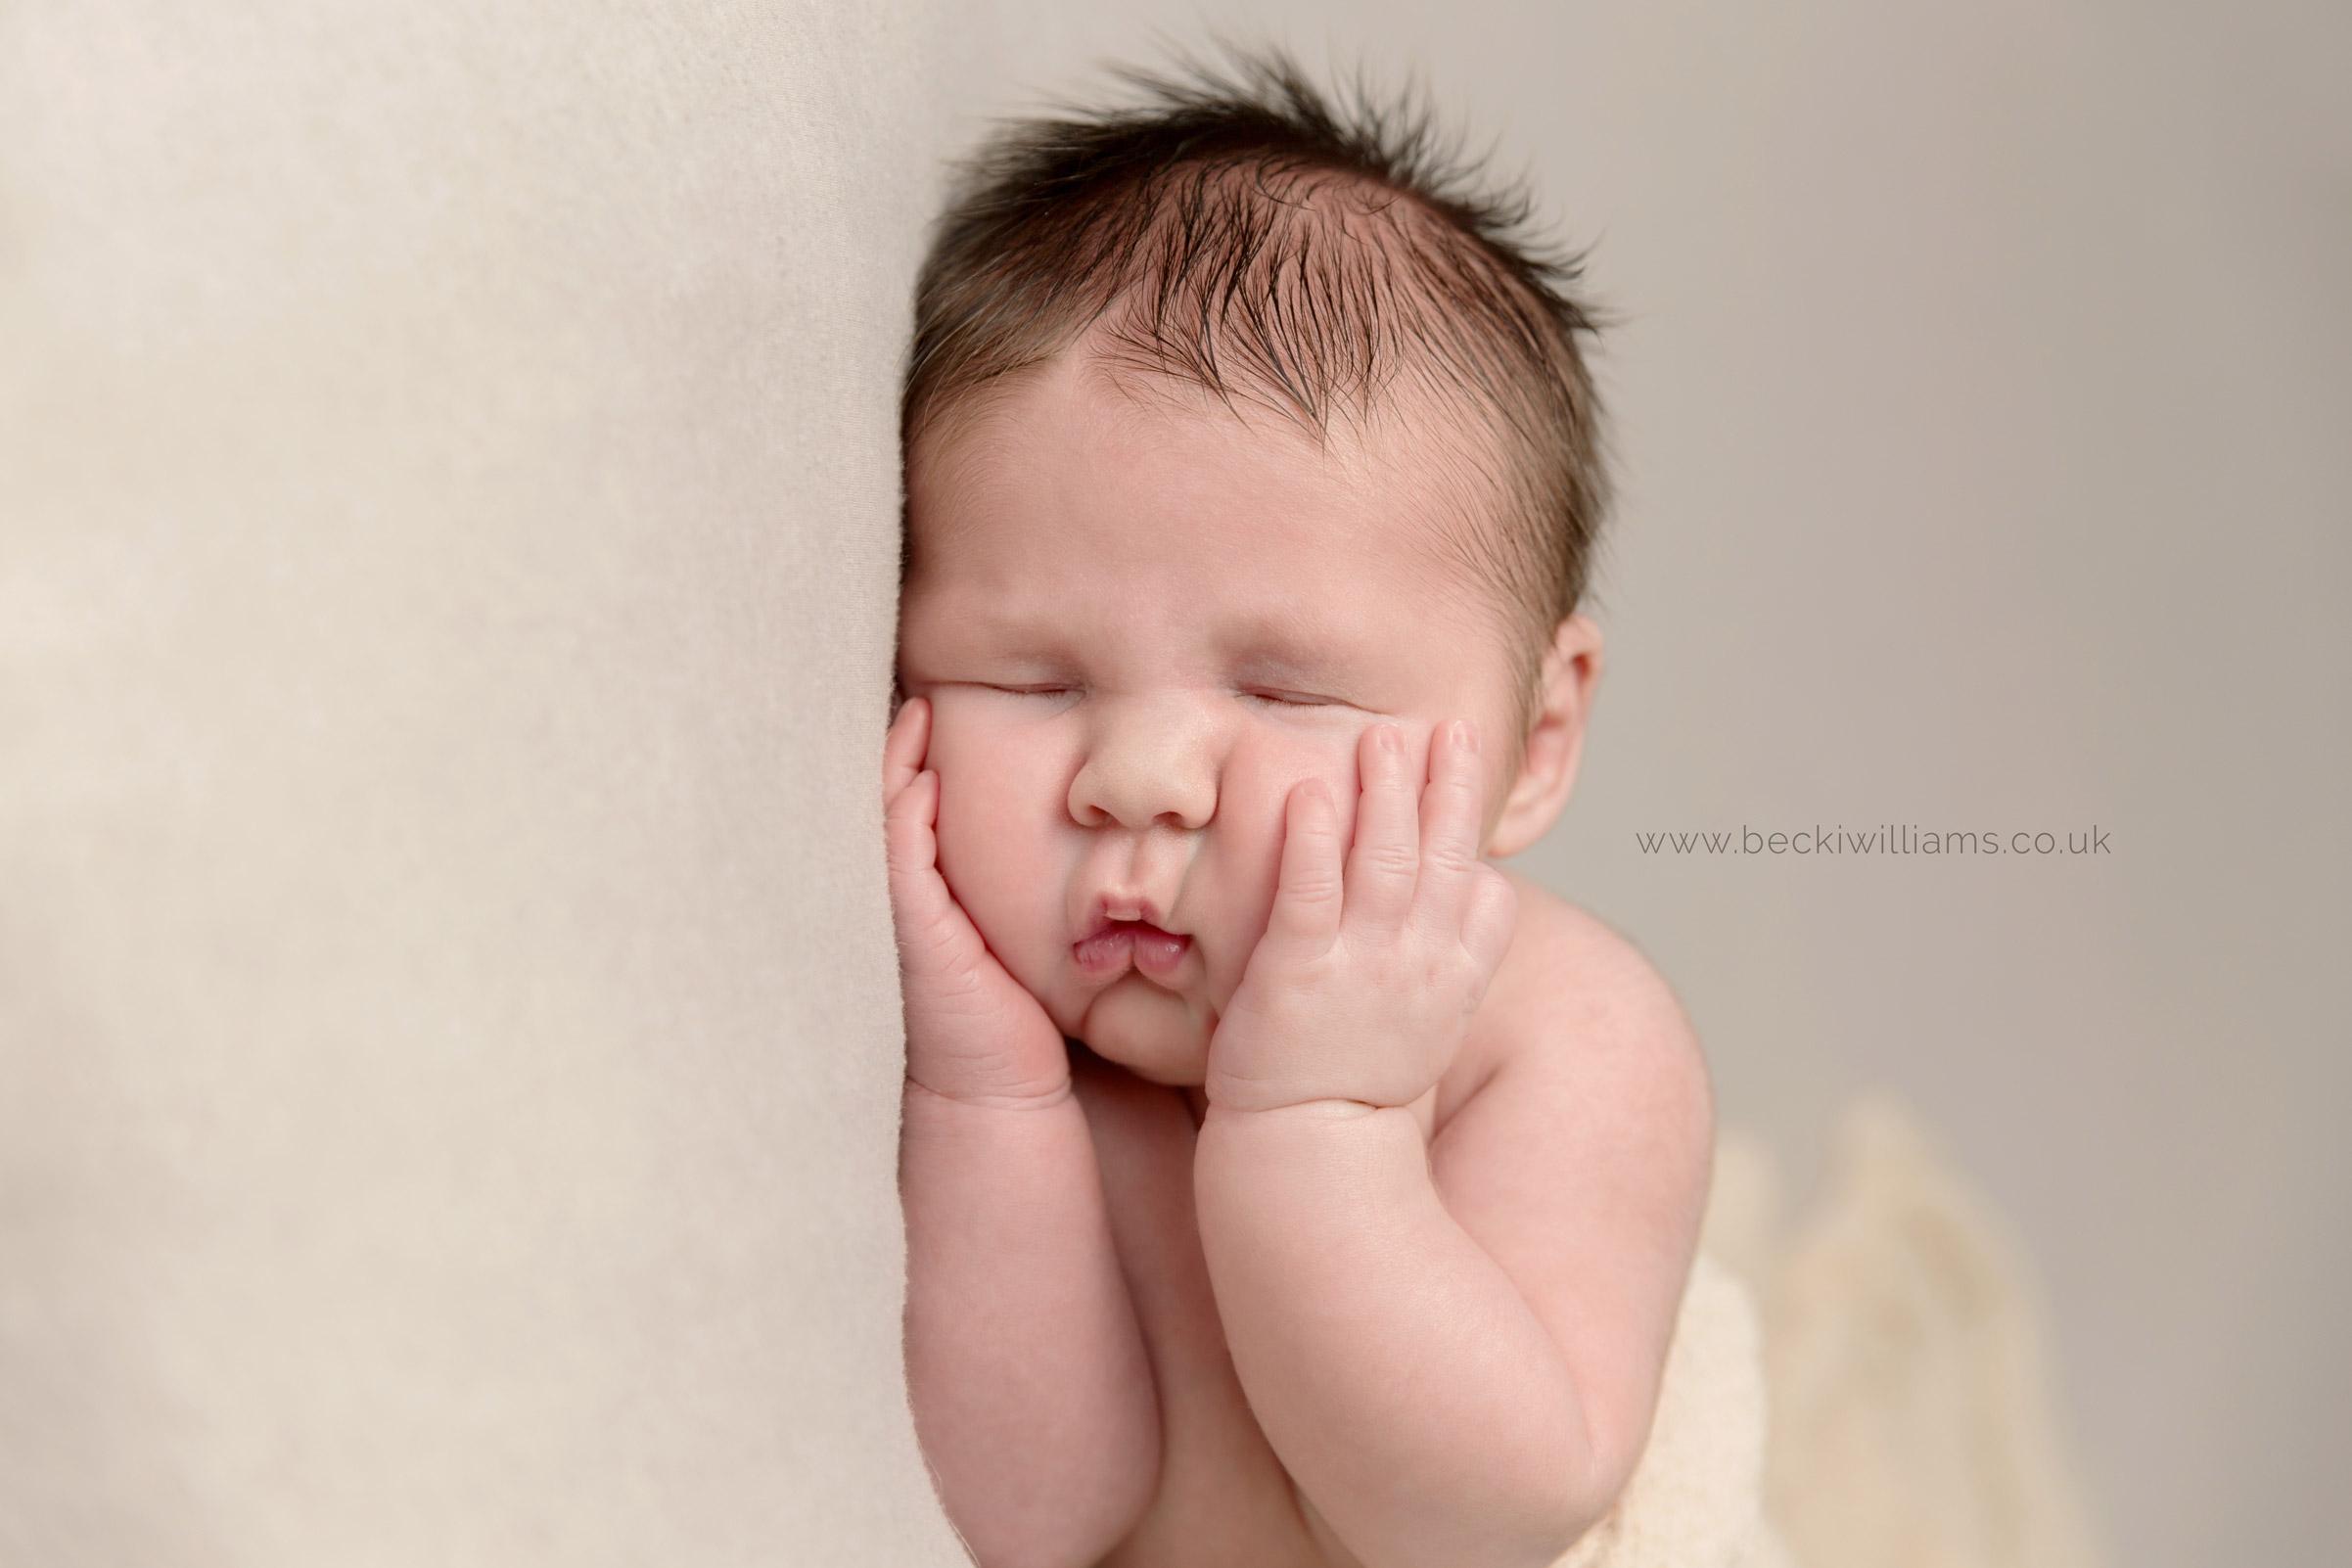 Newborn pictures in hemel hempstead - cute cheeks